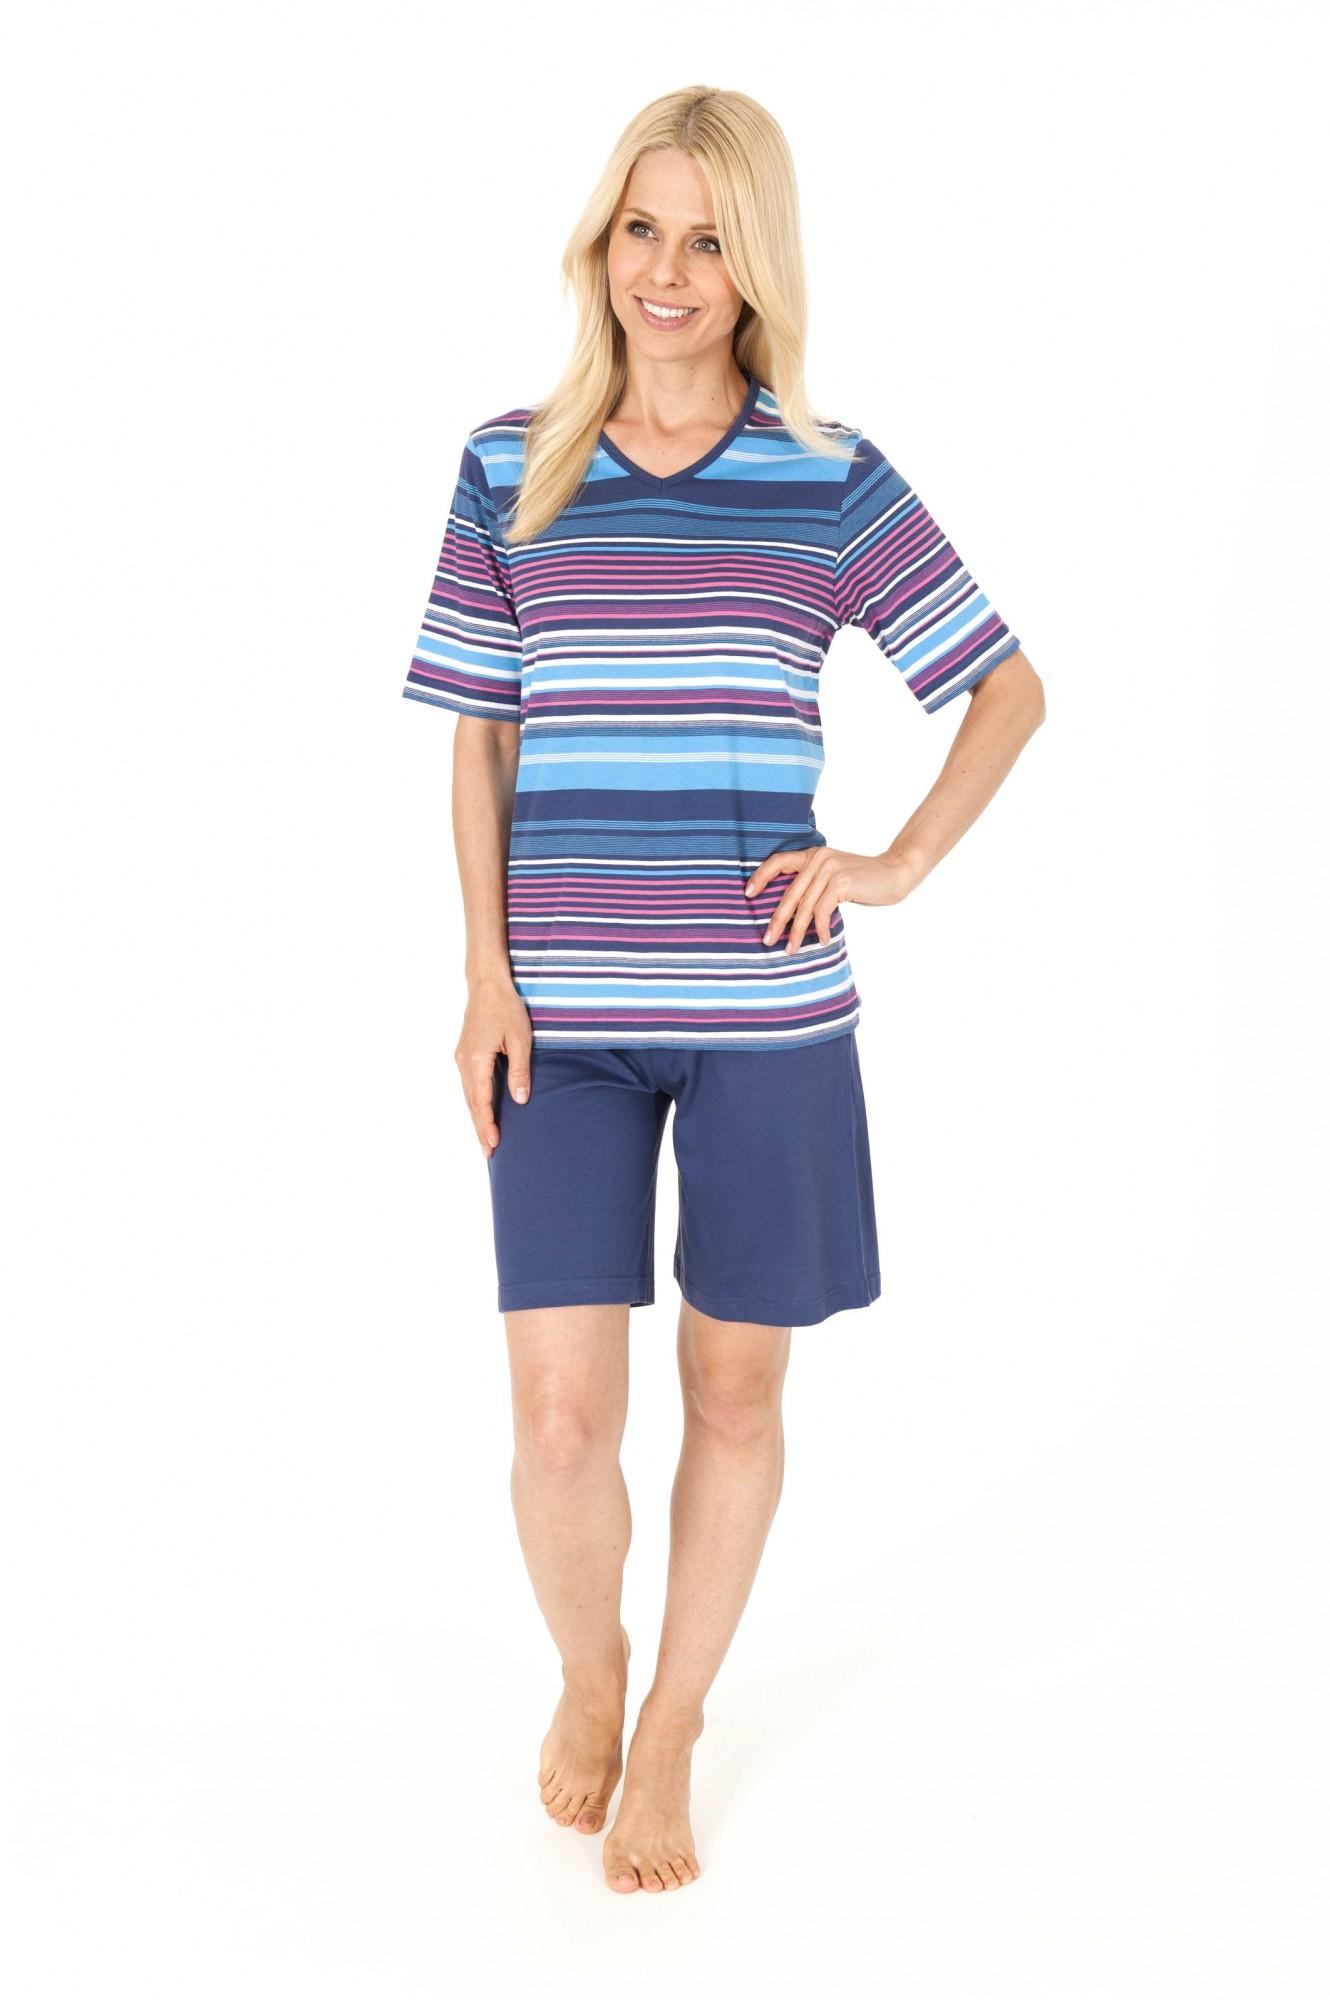 Schicker Damen Shorty Pyjama im Streifenlook – 161 205 90 893 001